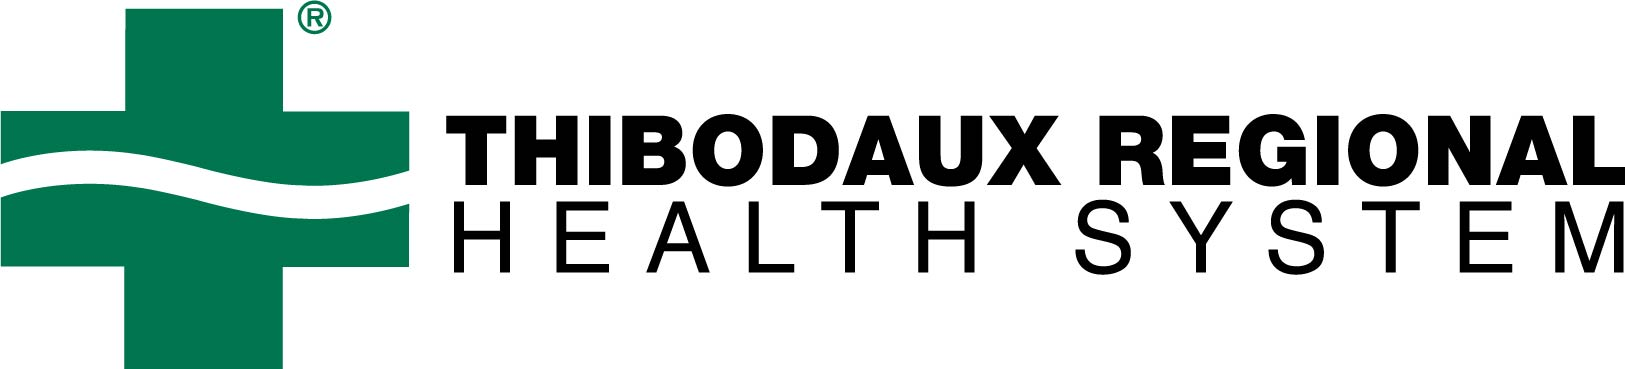 Thibodaux Regional Medical Center